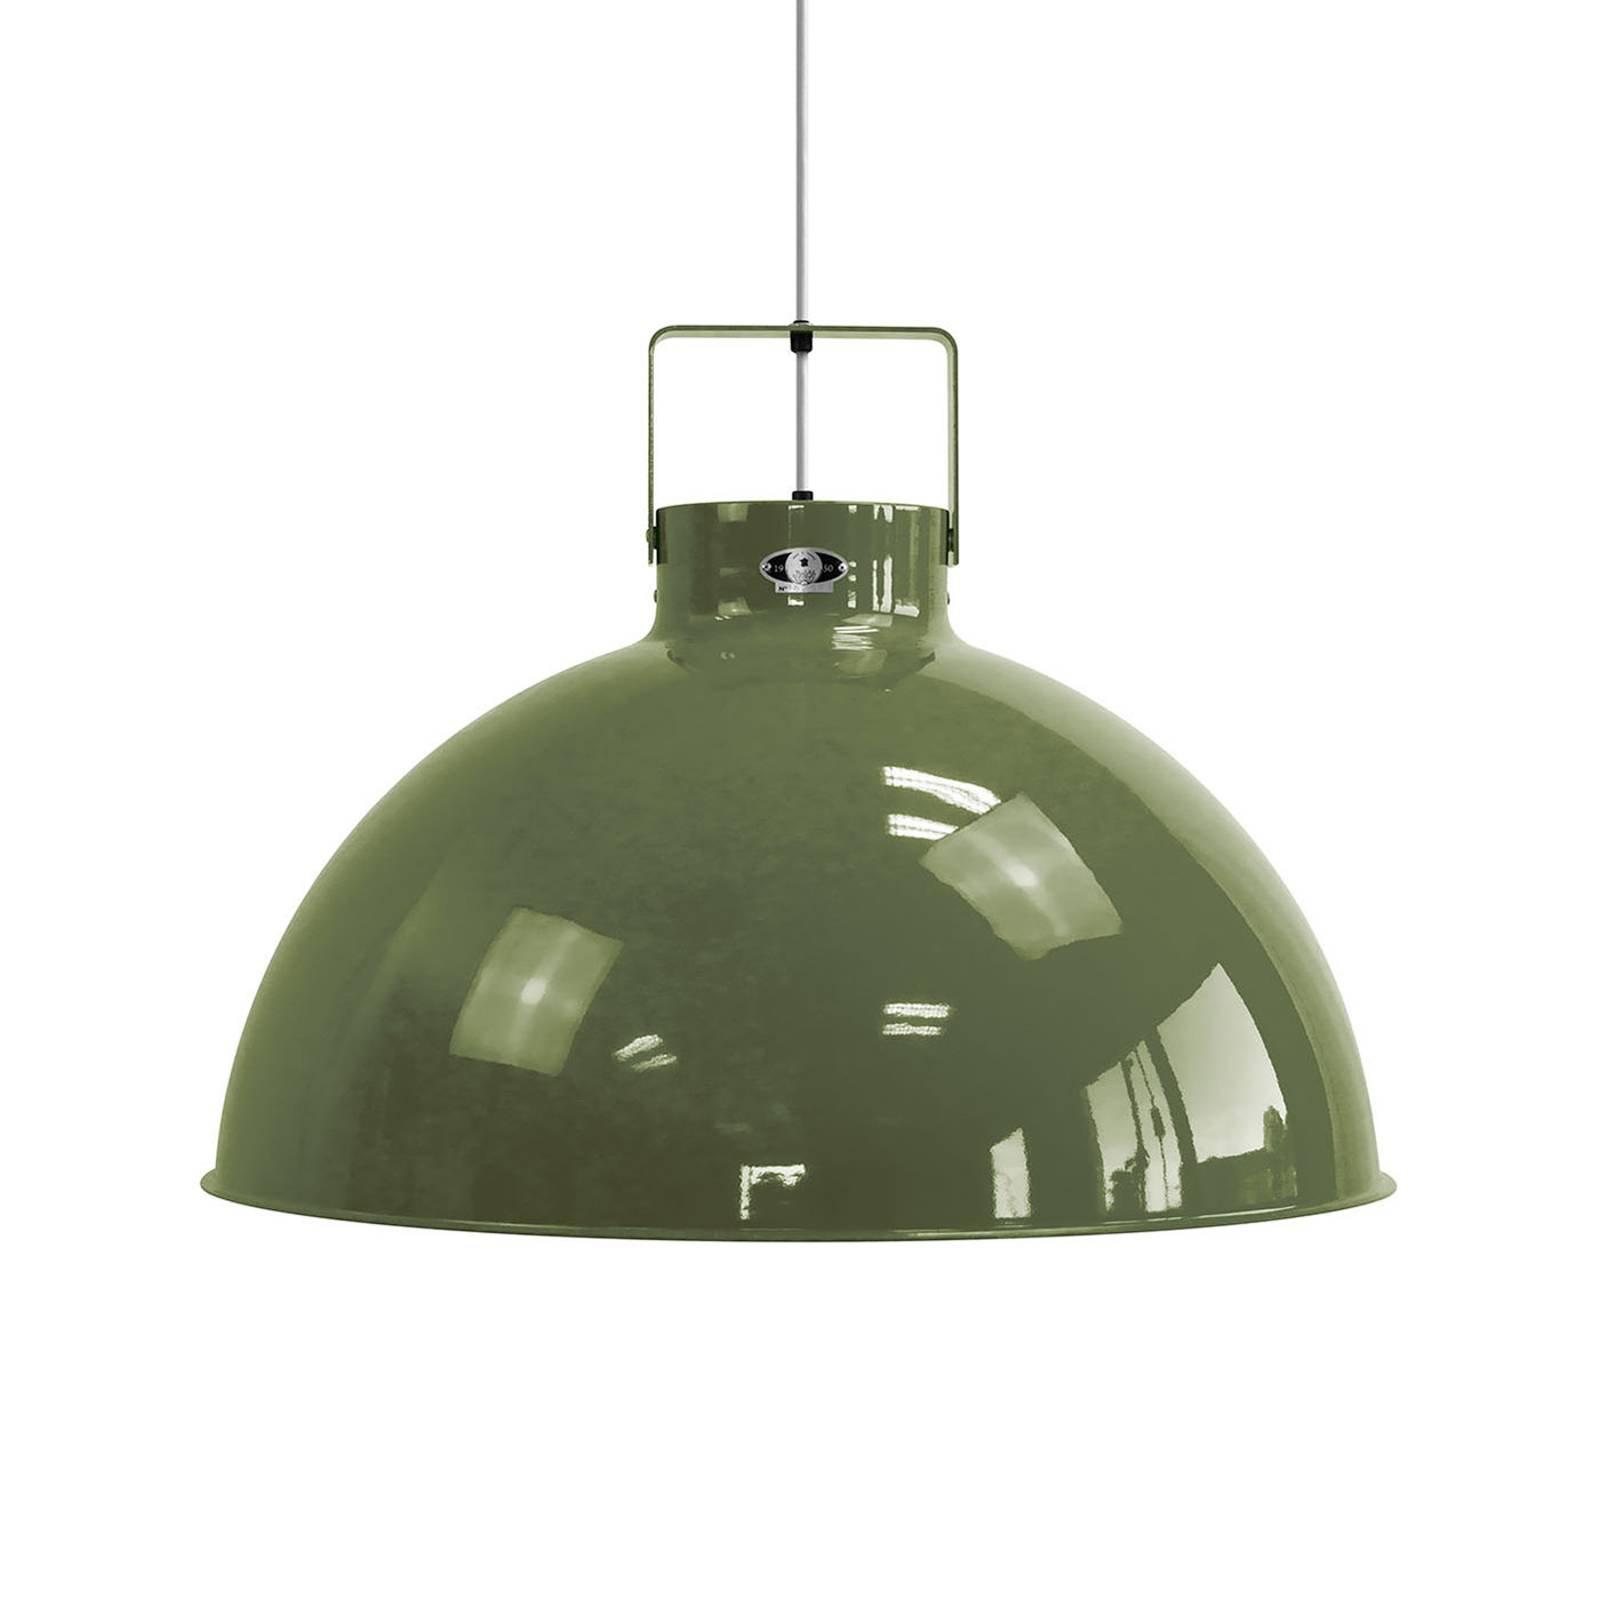 Jieldé Dante D675 hengelampe, olivengrønn, Ø67,5cm